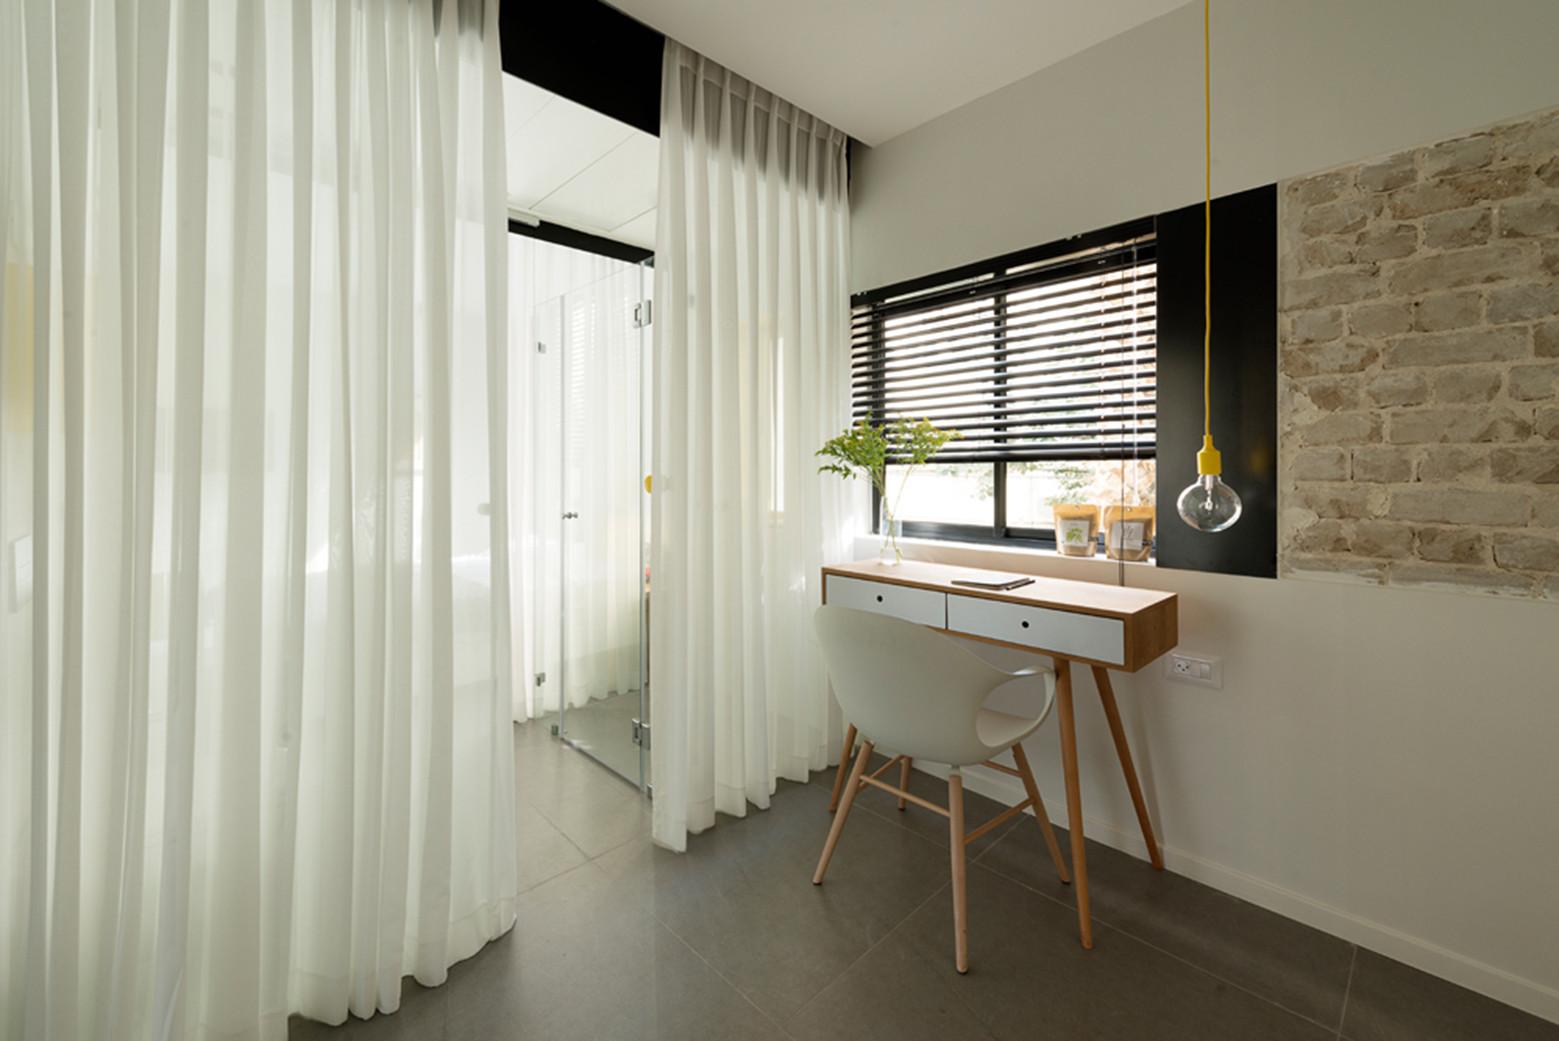 Studio Apartment Architecture gallery of apartment in tel aviv / amir navon-studio 6b, maayan